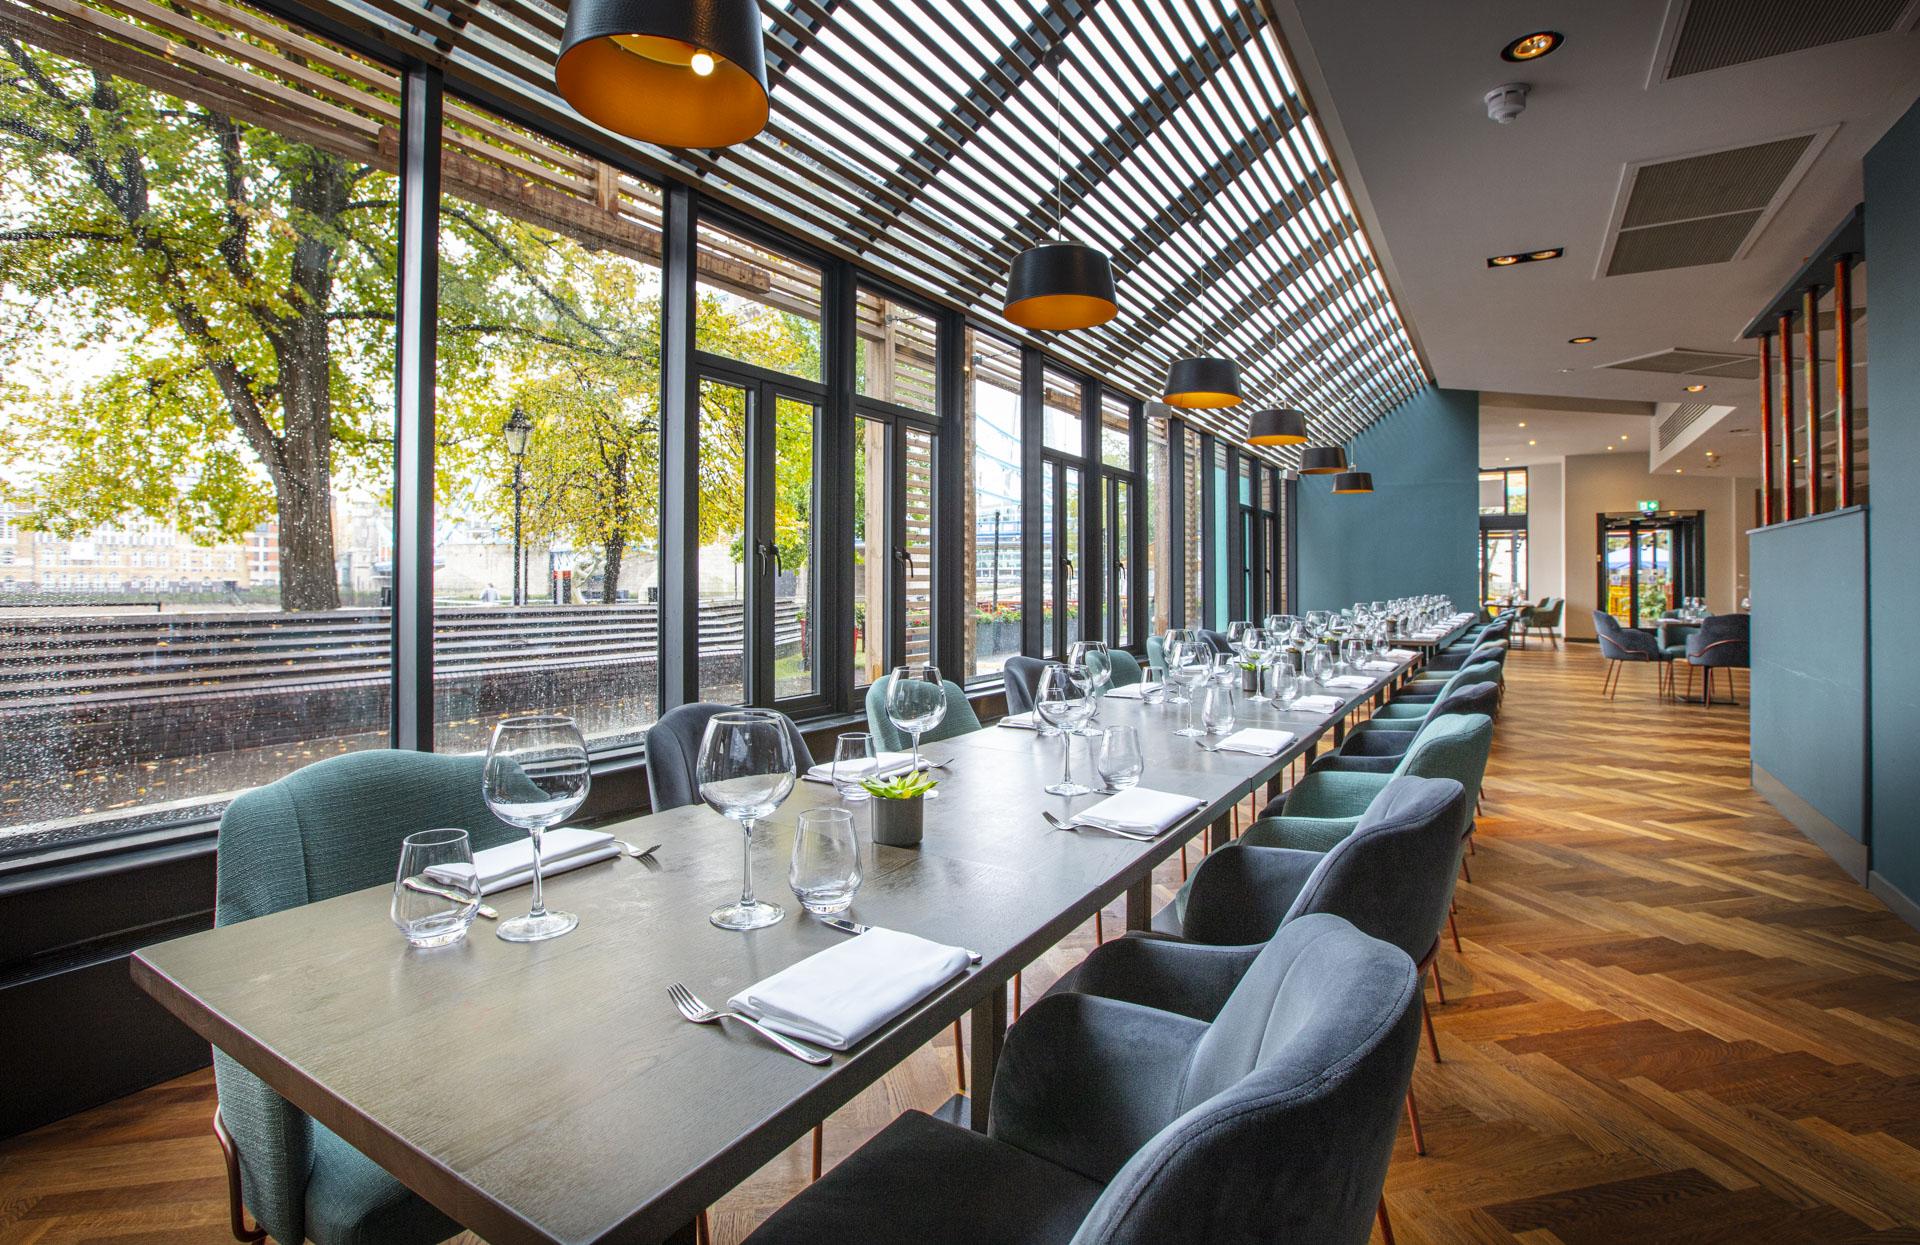 Vicinity | London Restaurant Reviews | DesignMyNight